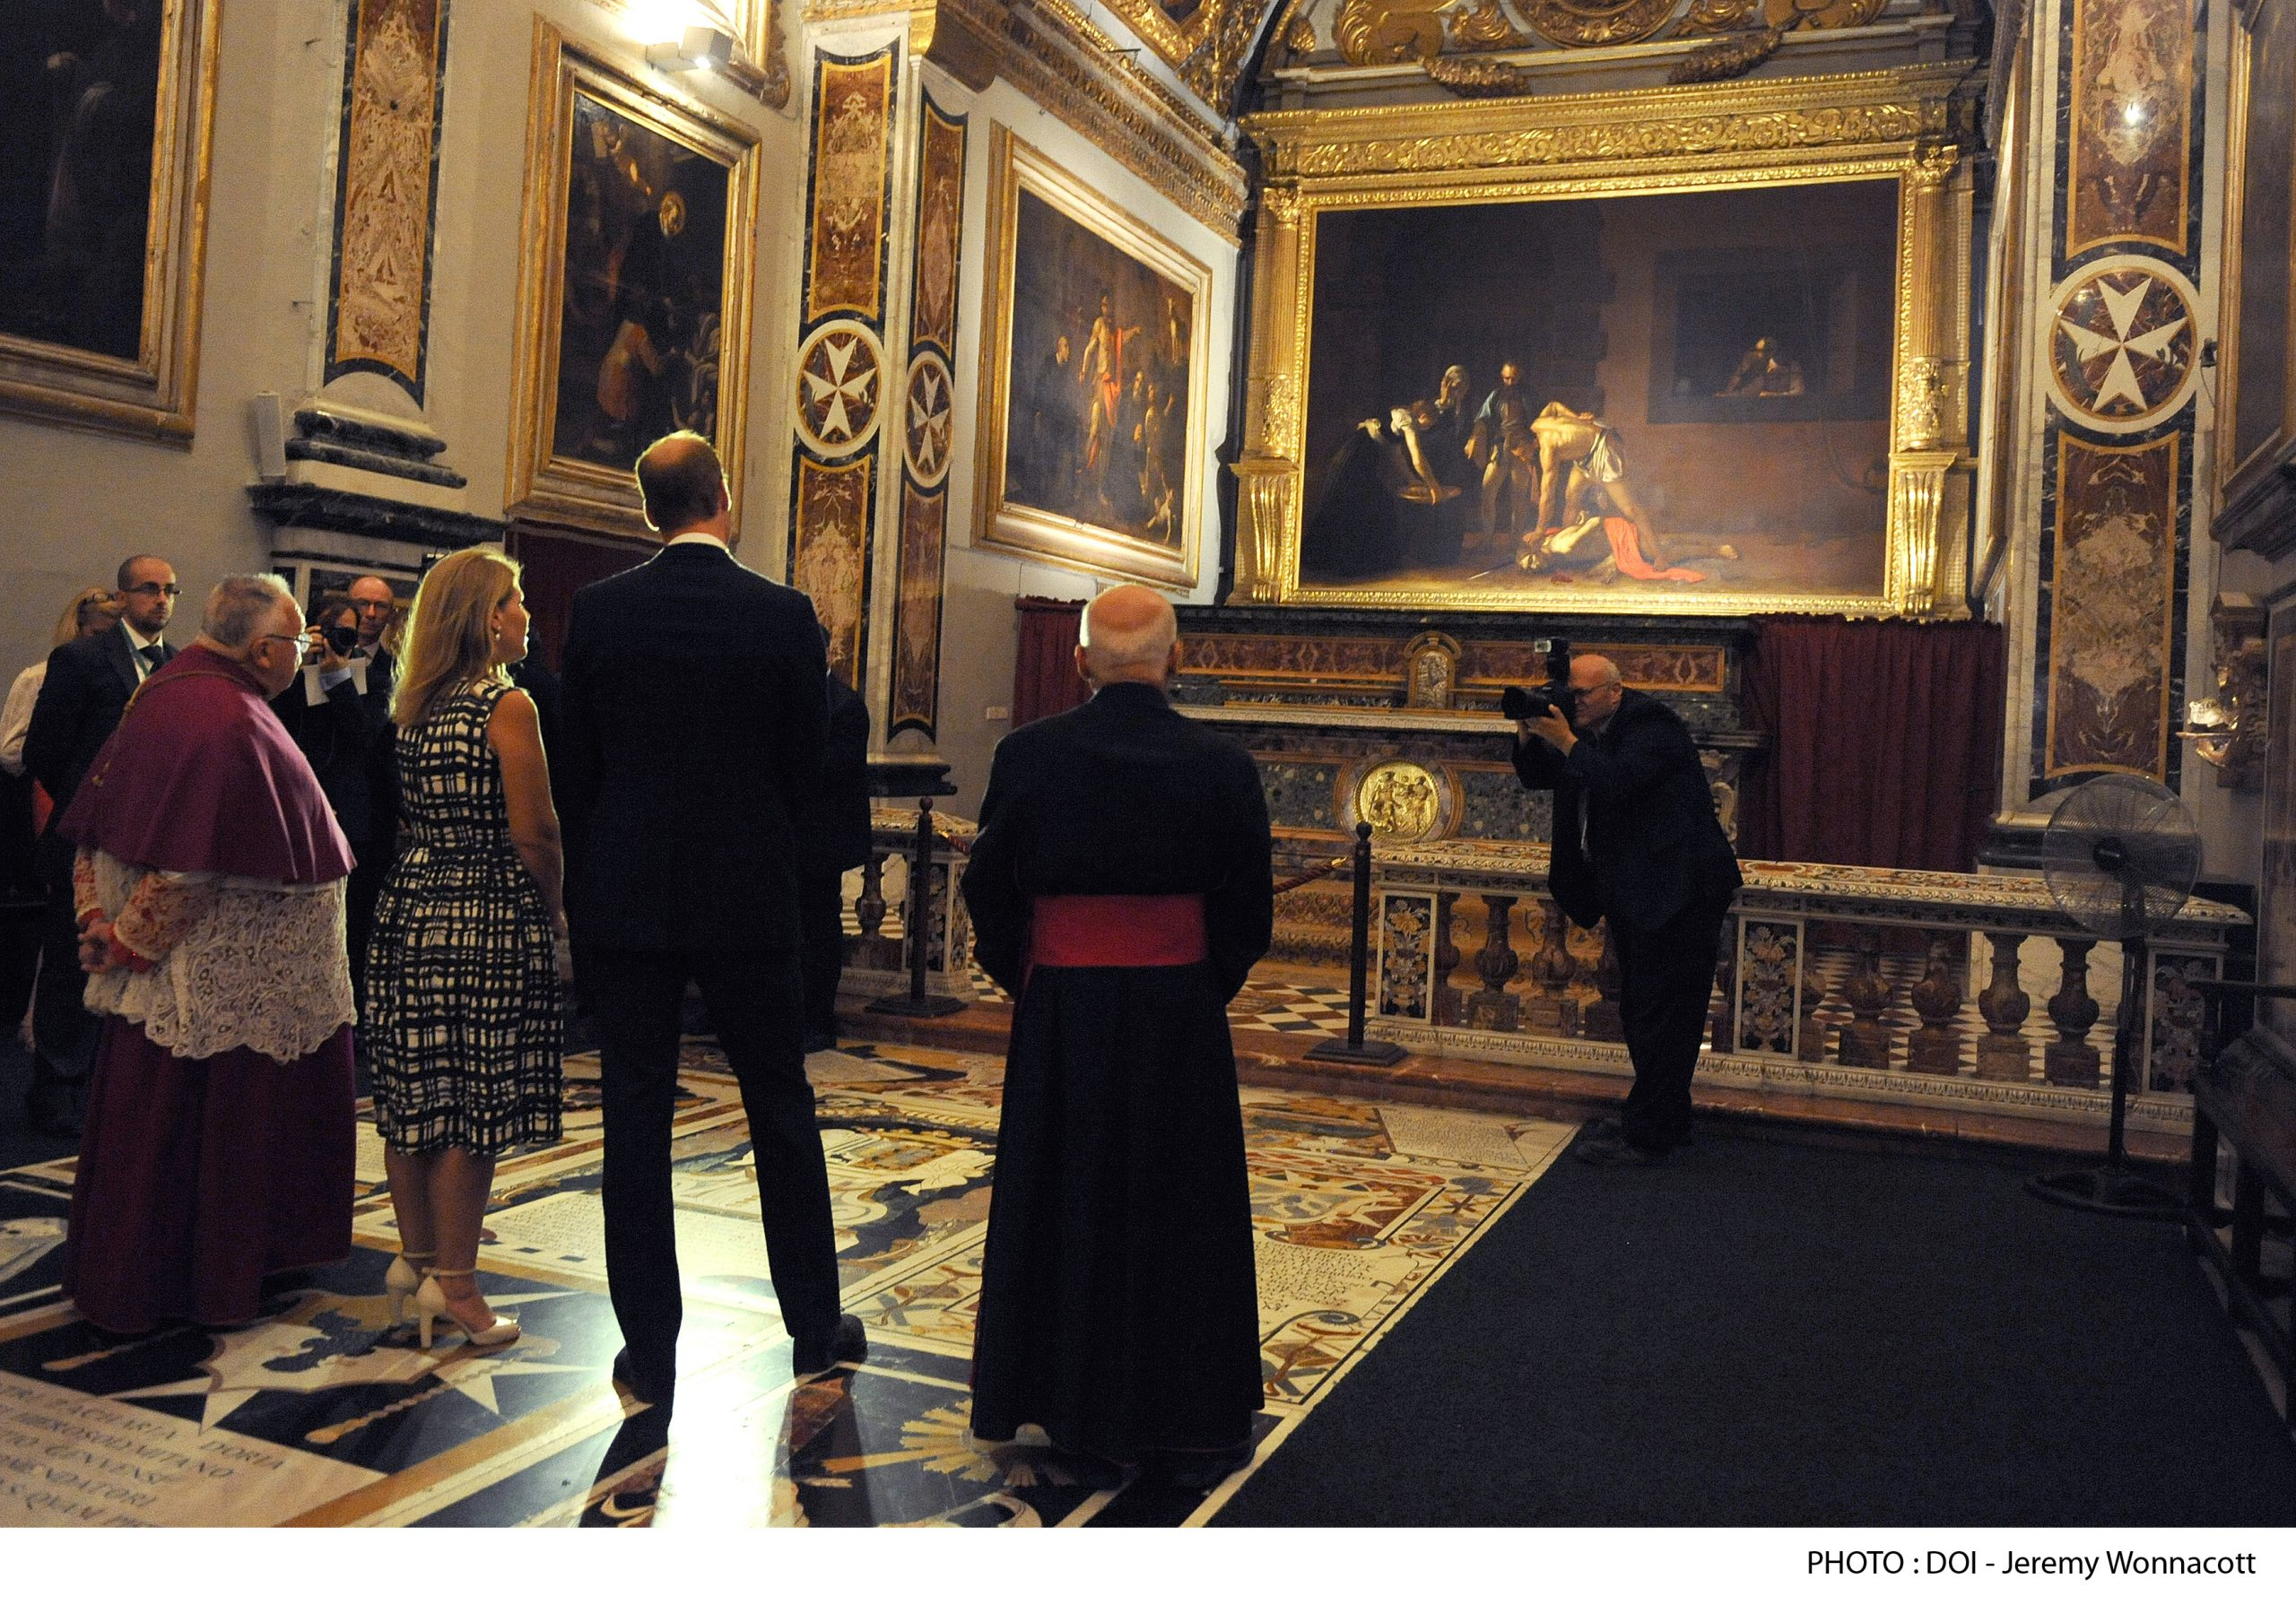 Caravaggio masterpieces in Malta